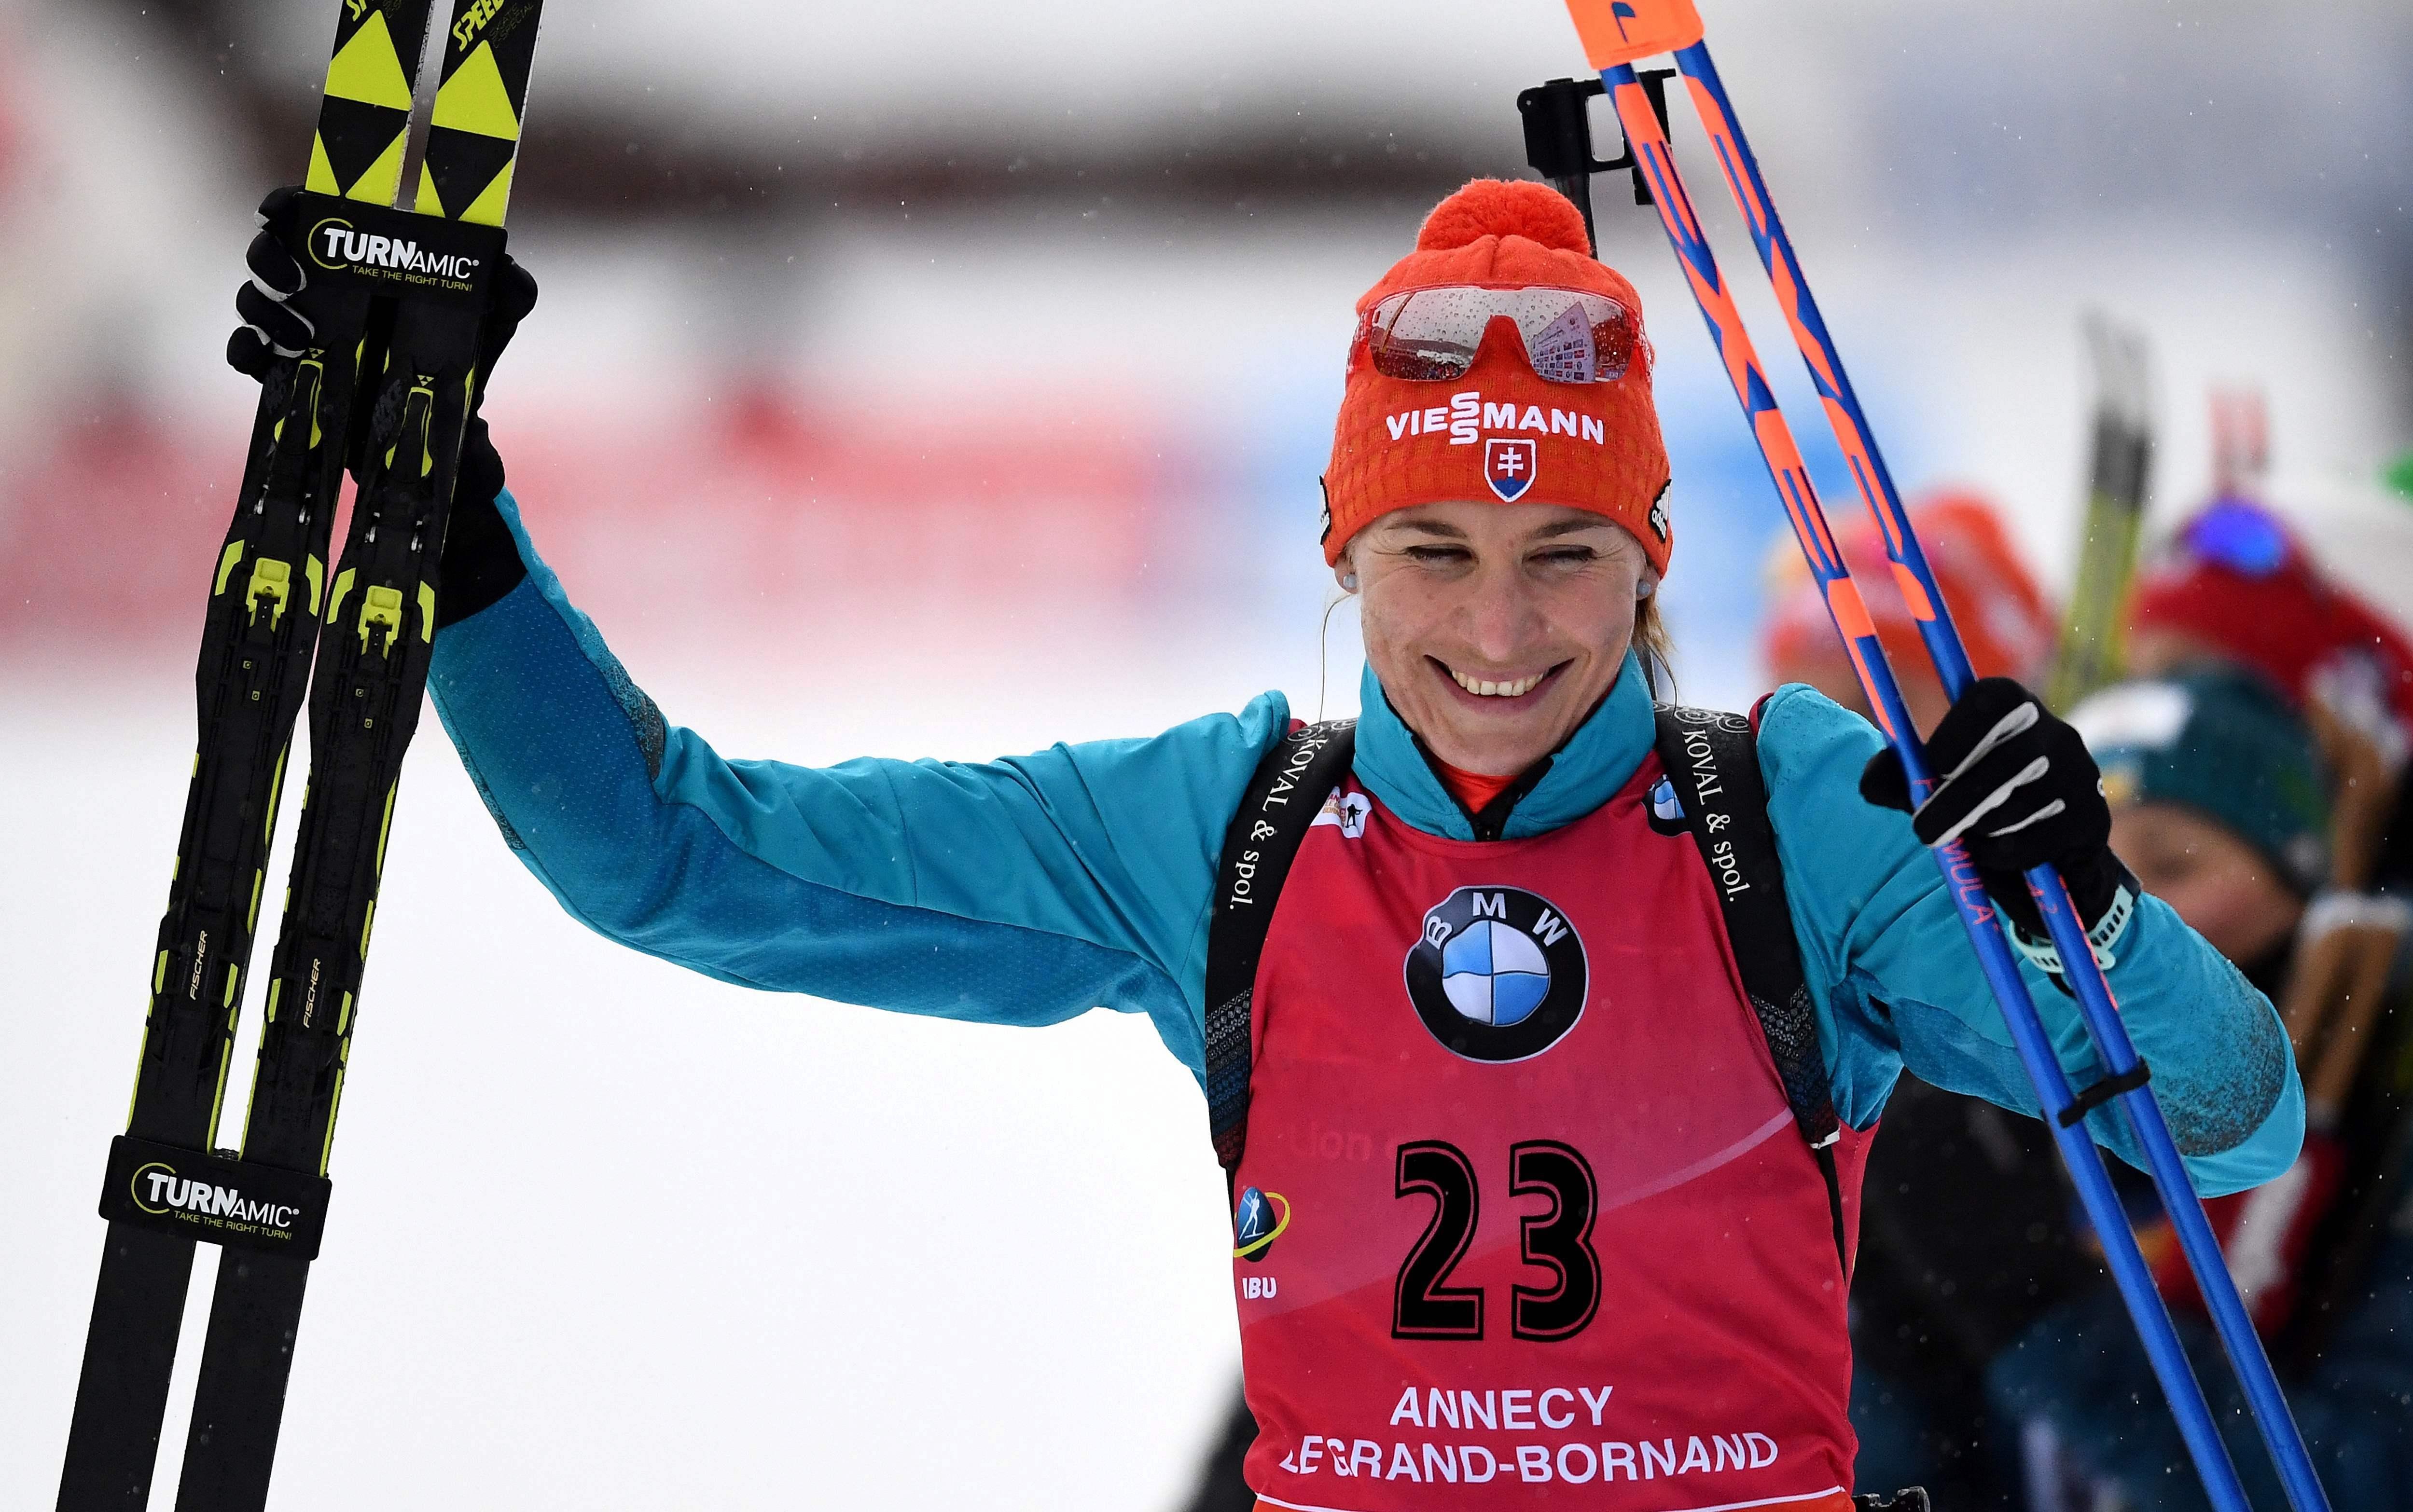 Sports d'hiver - Grand-Bornand : Kuzmina sans rivale, les Françaises ratent la cible